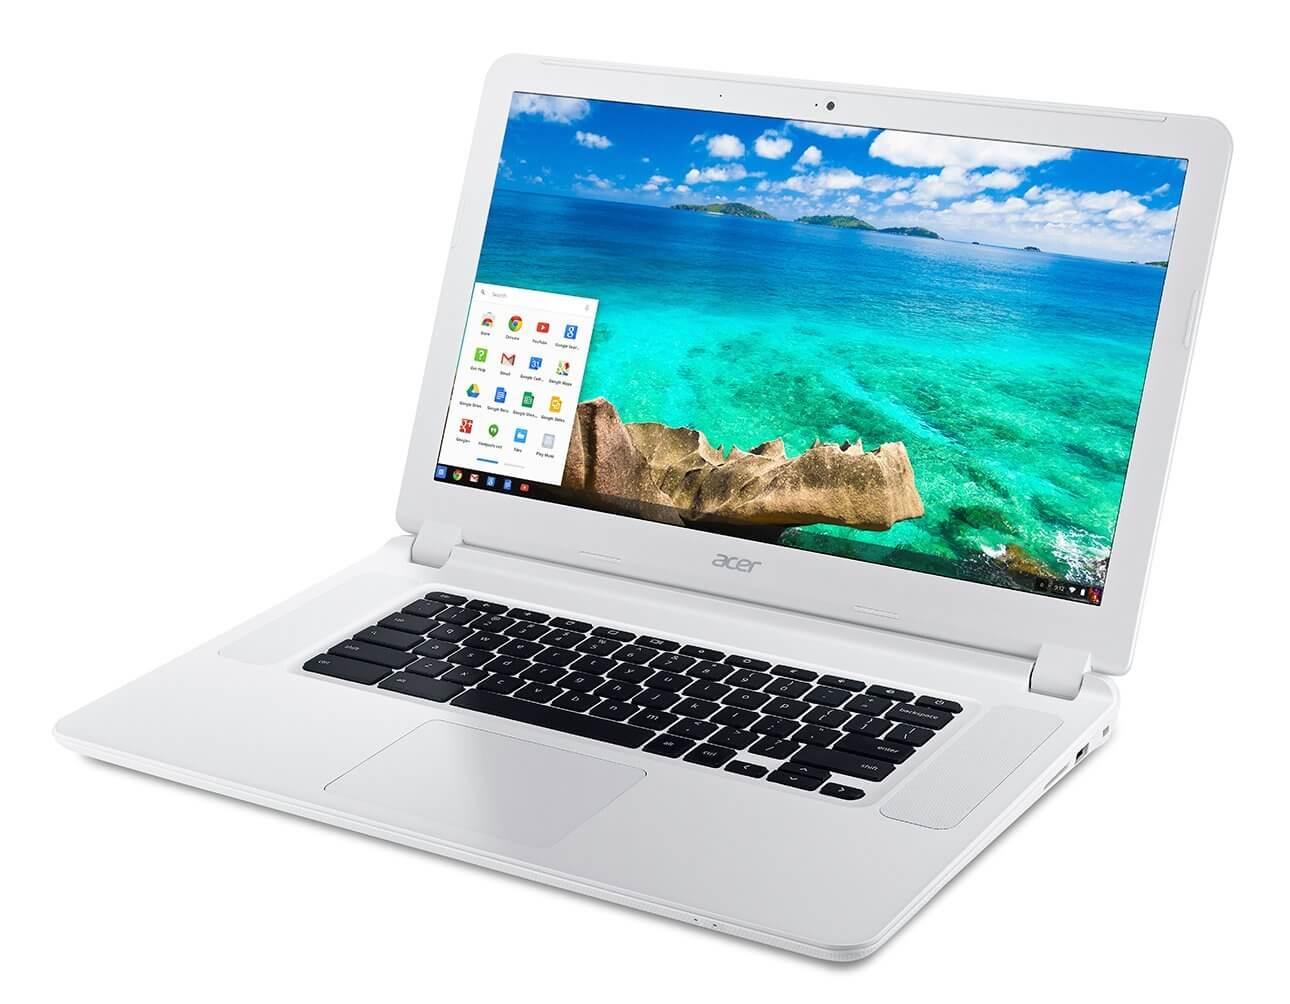 Acer Chromebook 15 best Laptops under 500